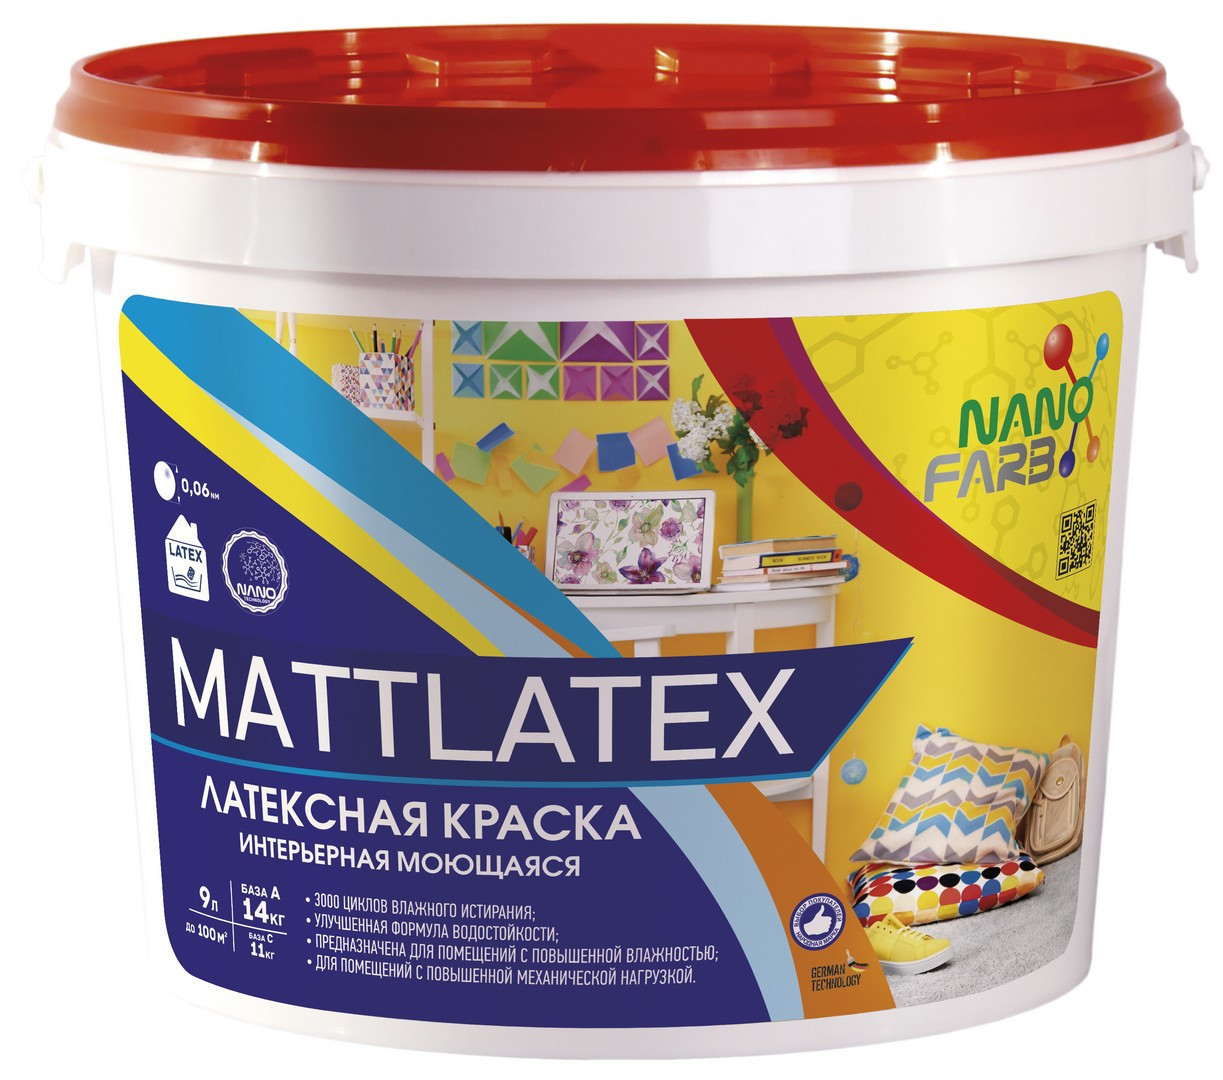 Интерьерная акриловая латексная краска моющая Mattlatex Nano farb TR Base 11 кг/ 9 л